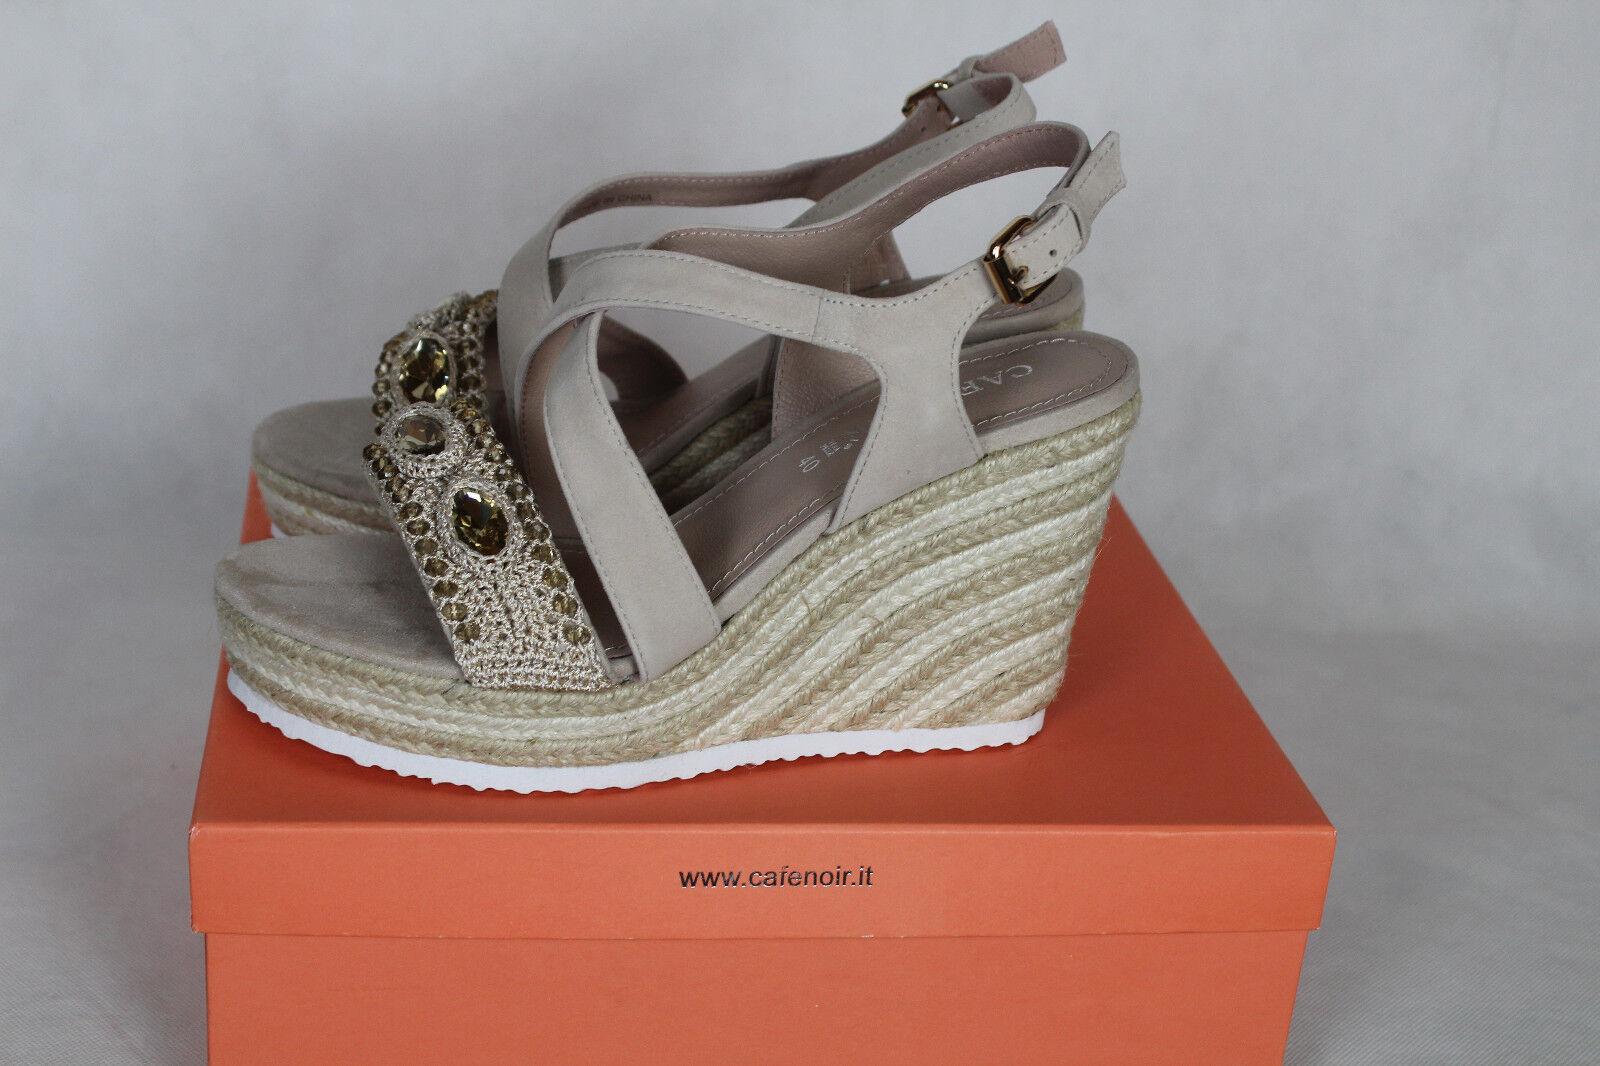 Cafenoir mhg551 196 Sabbia Plate-forme sandales compenses, Femmes Taille 40,neu, LP